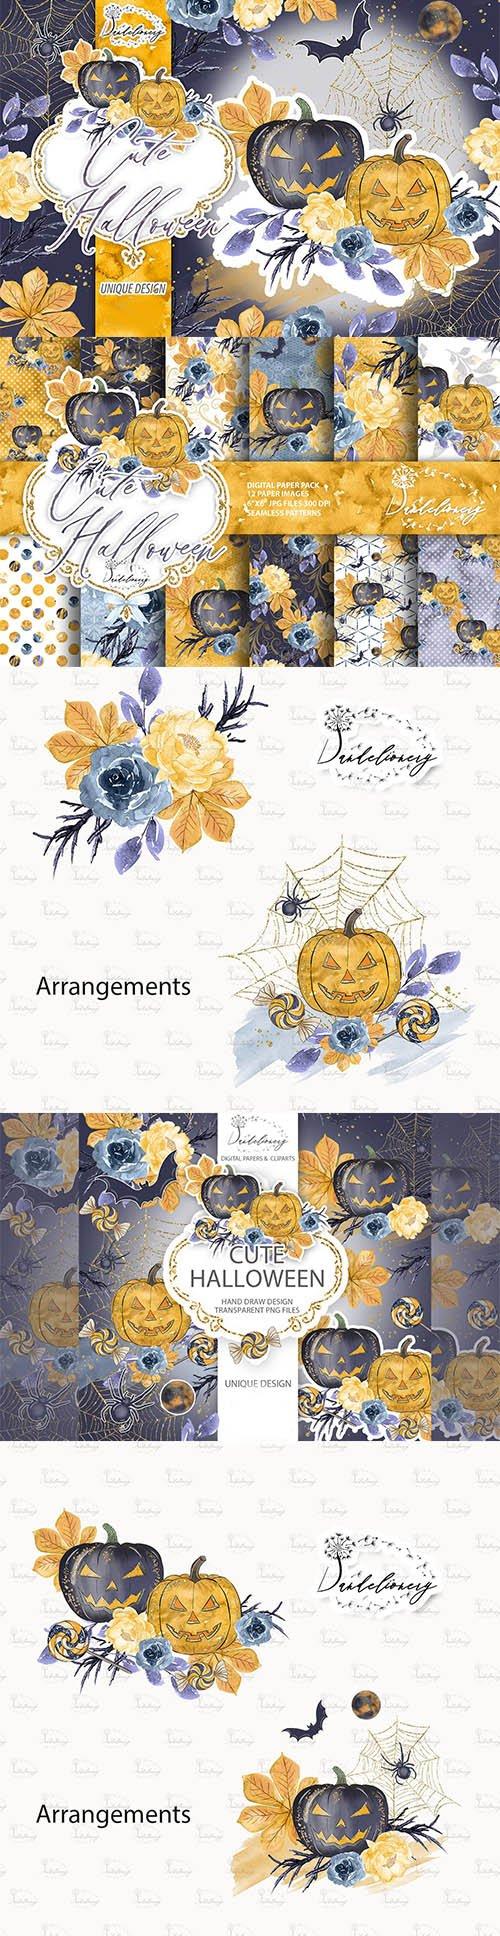 Cute Halloween design and digital paper